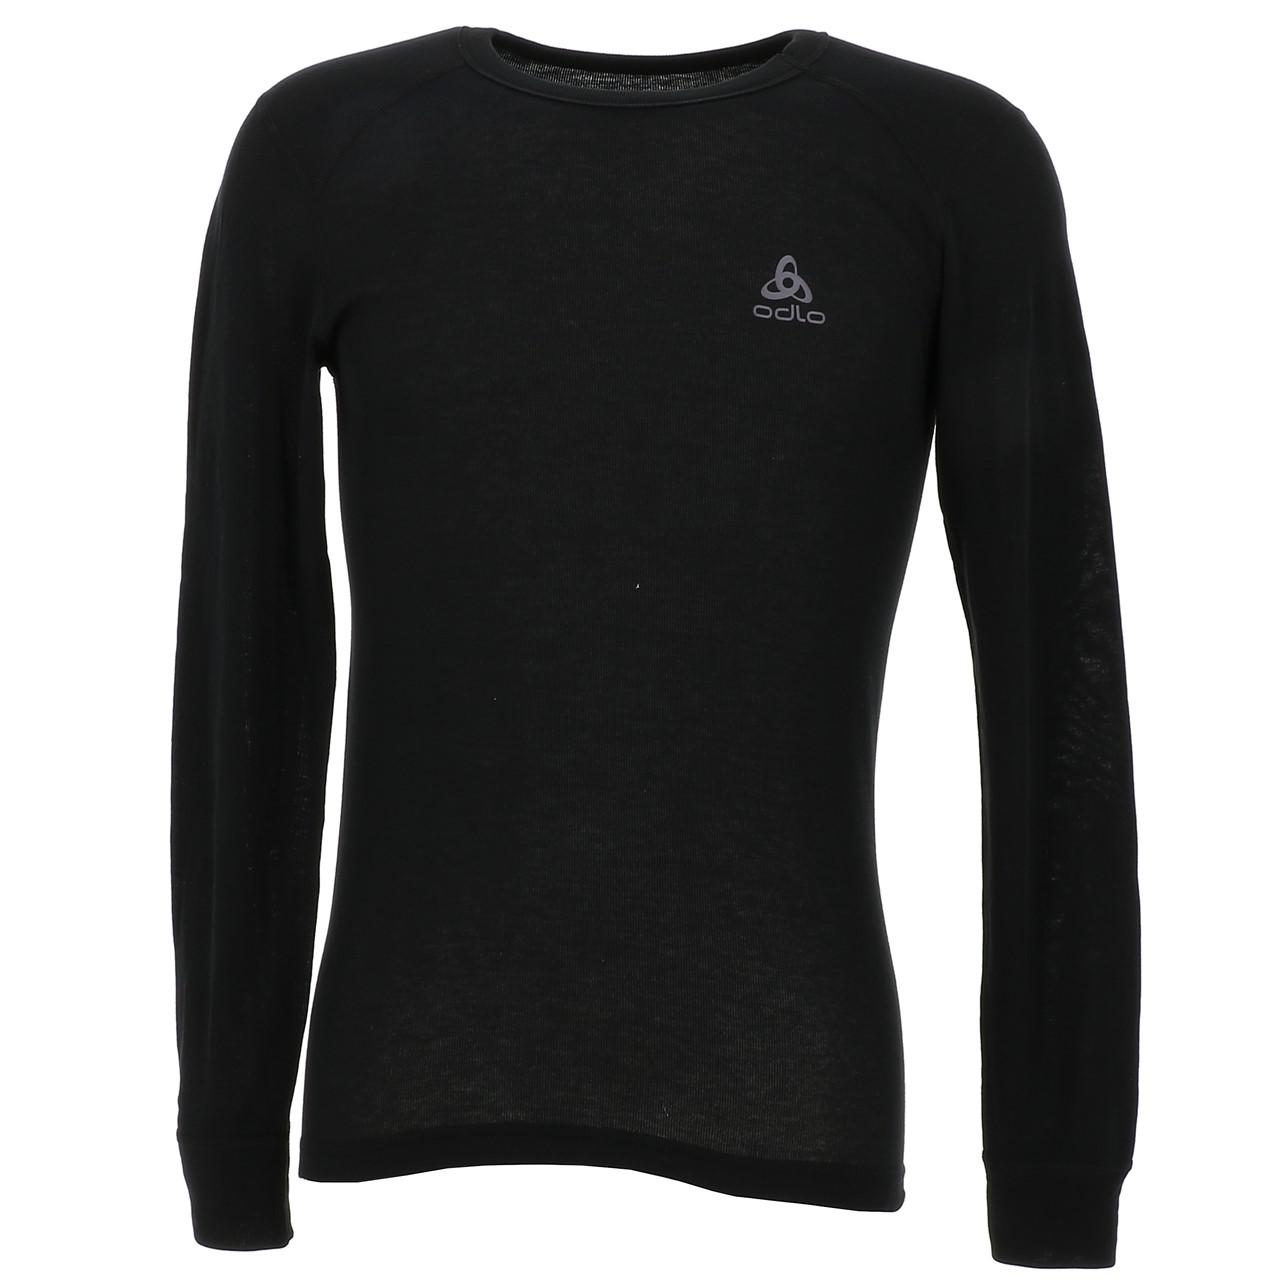 Under-Clothing-Thermal-Hot-Odlo-Warm-Black-DRC-ML-Tee-Black-85353-New